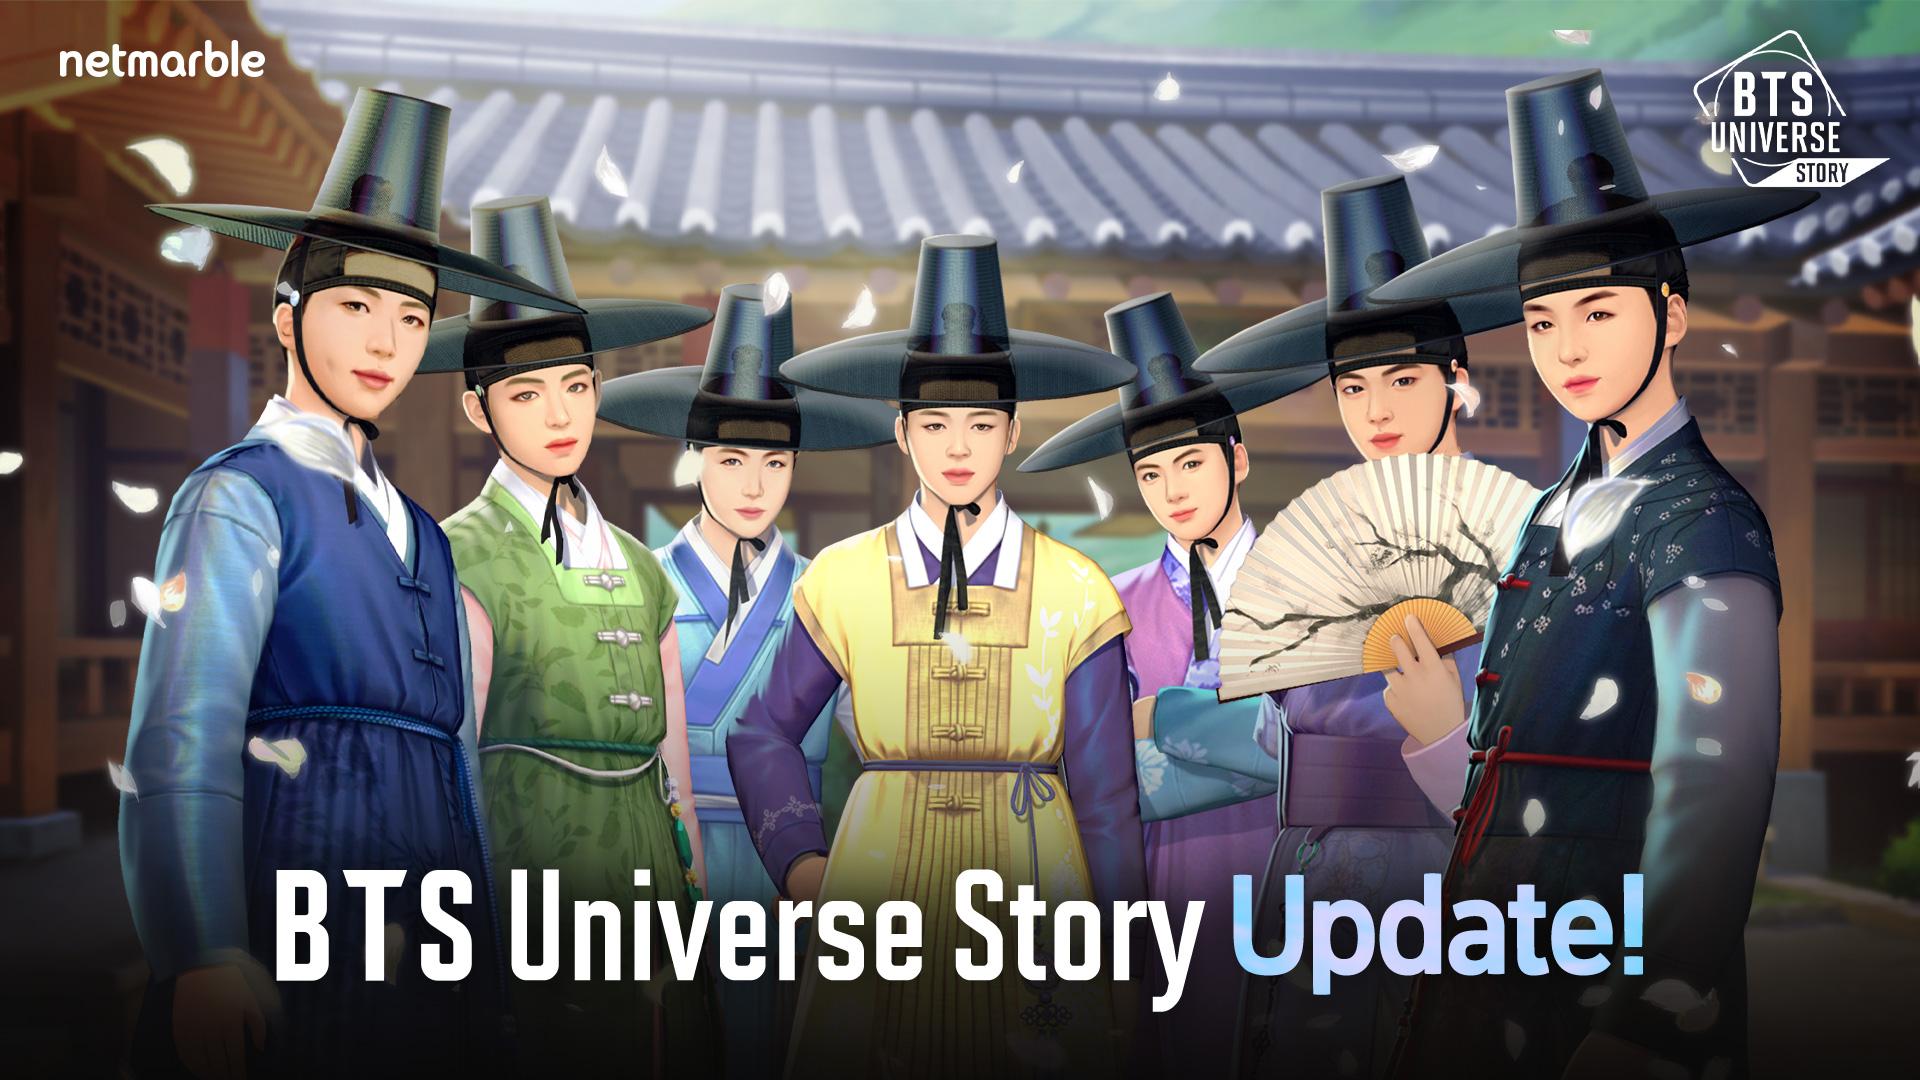 BTS Universe Story 29102020